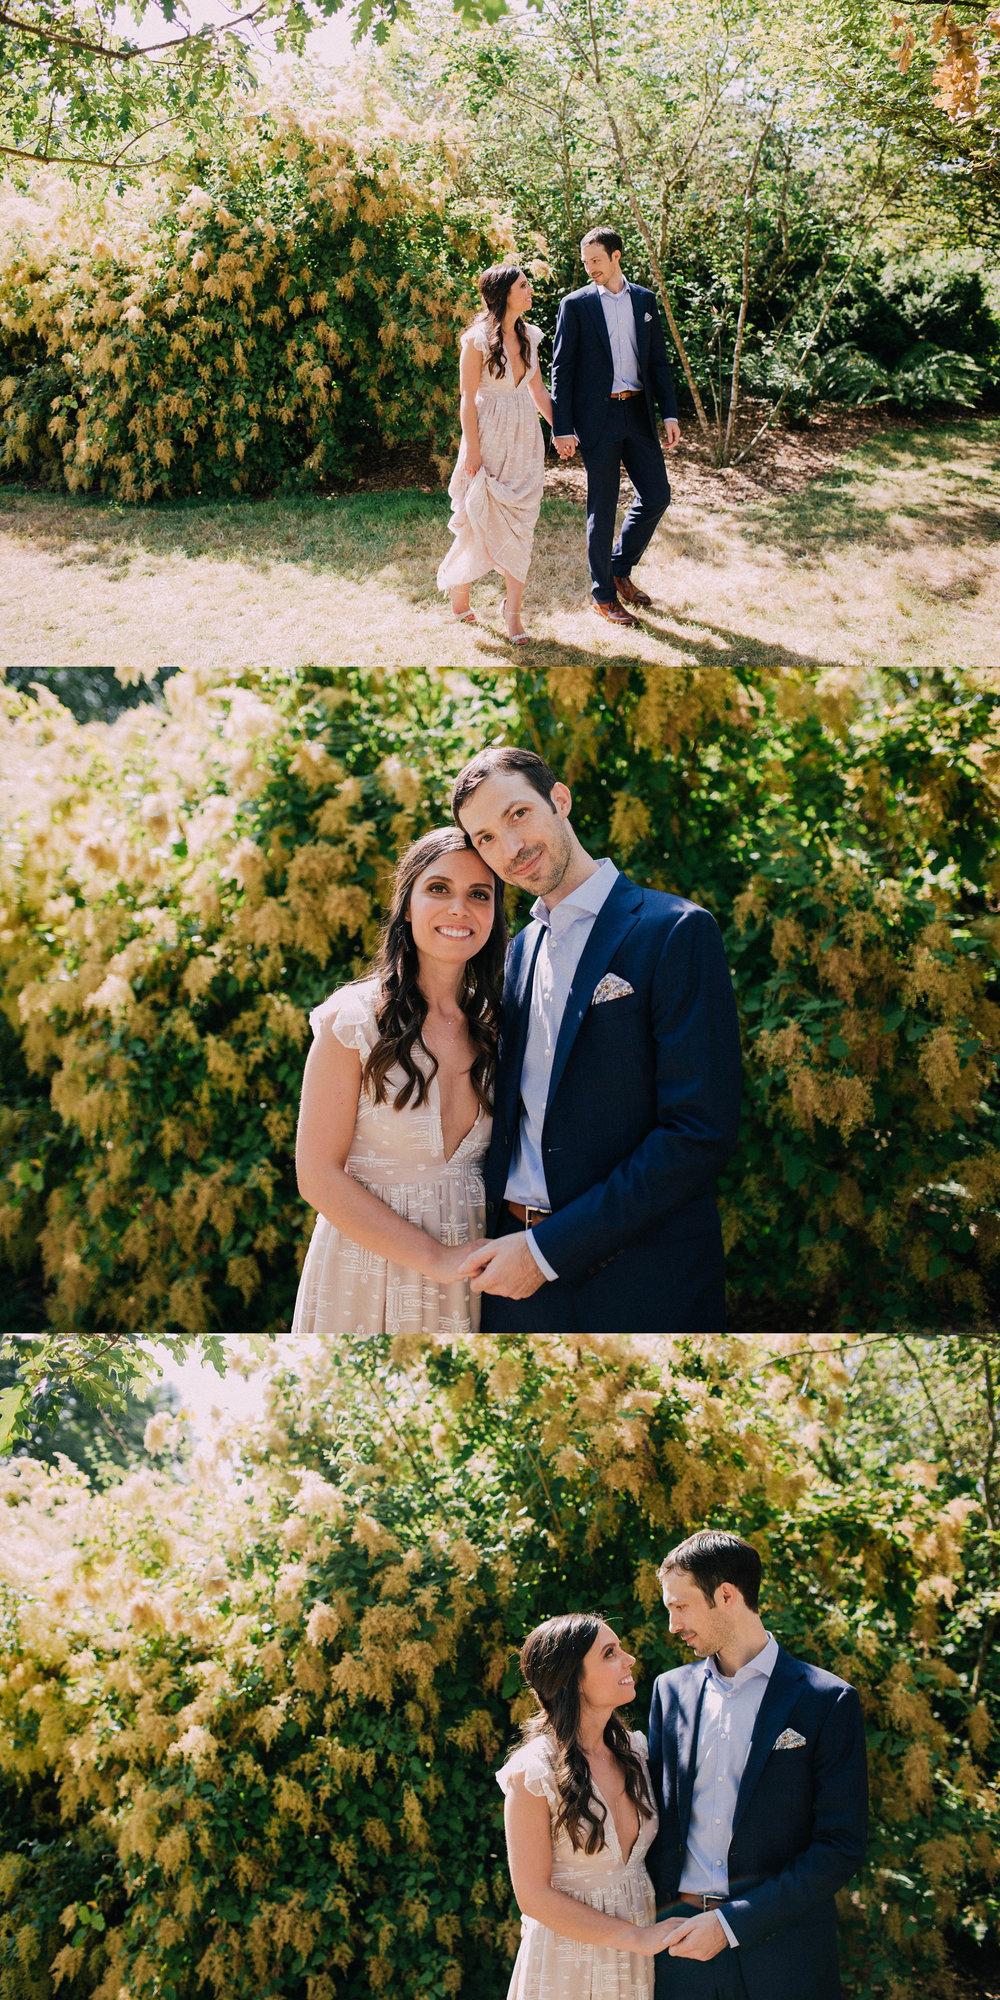 Seattle courthouse and wedding photographer ballard wedding ashley vos-6.jpg